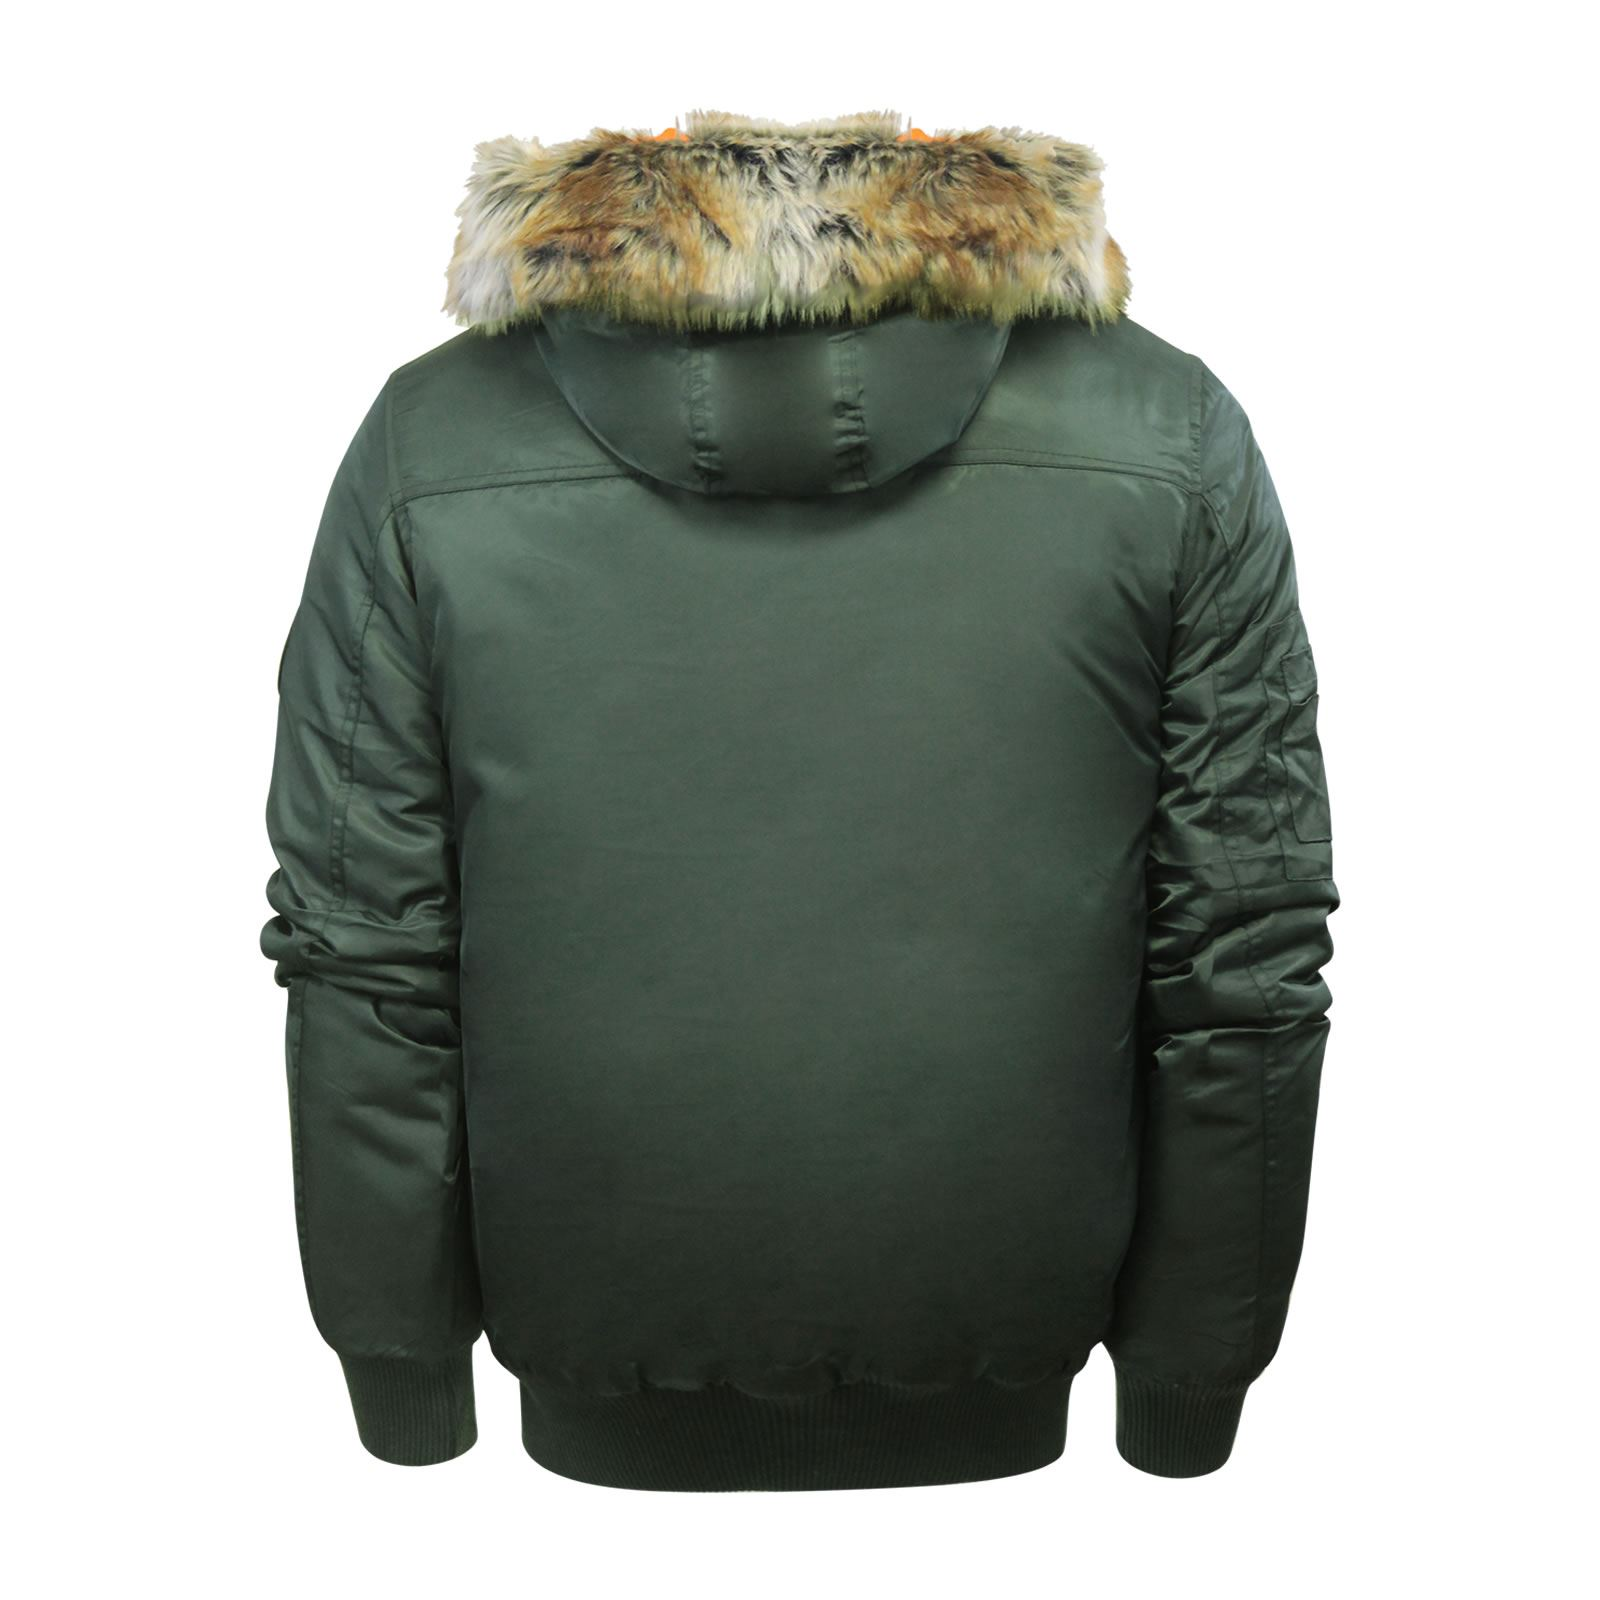 Crosshatch Newbomb Mens Jacket Fur Hooded Bomber Parka Coat Ebay